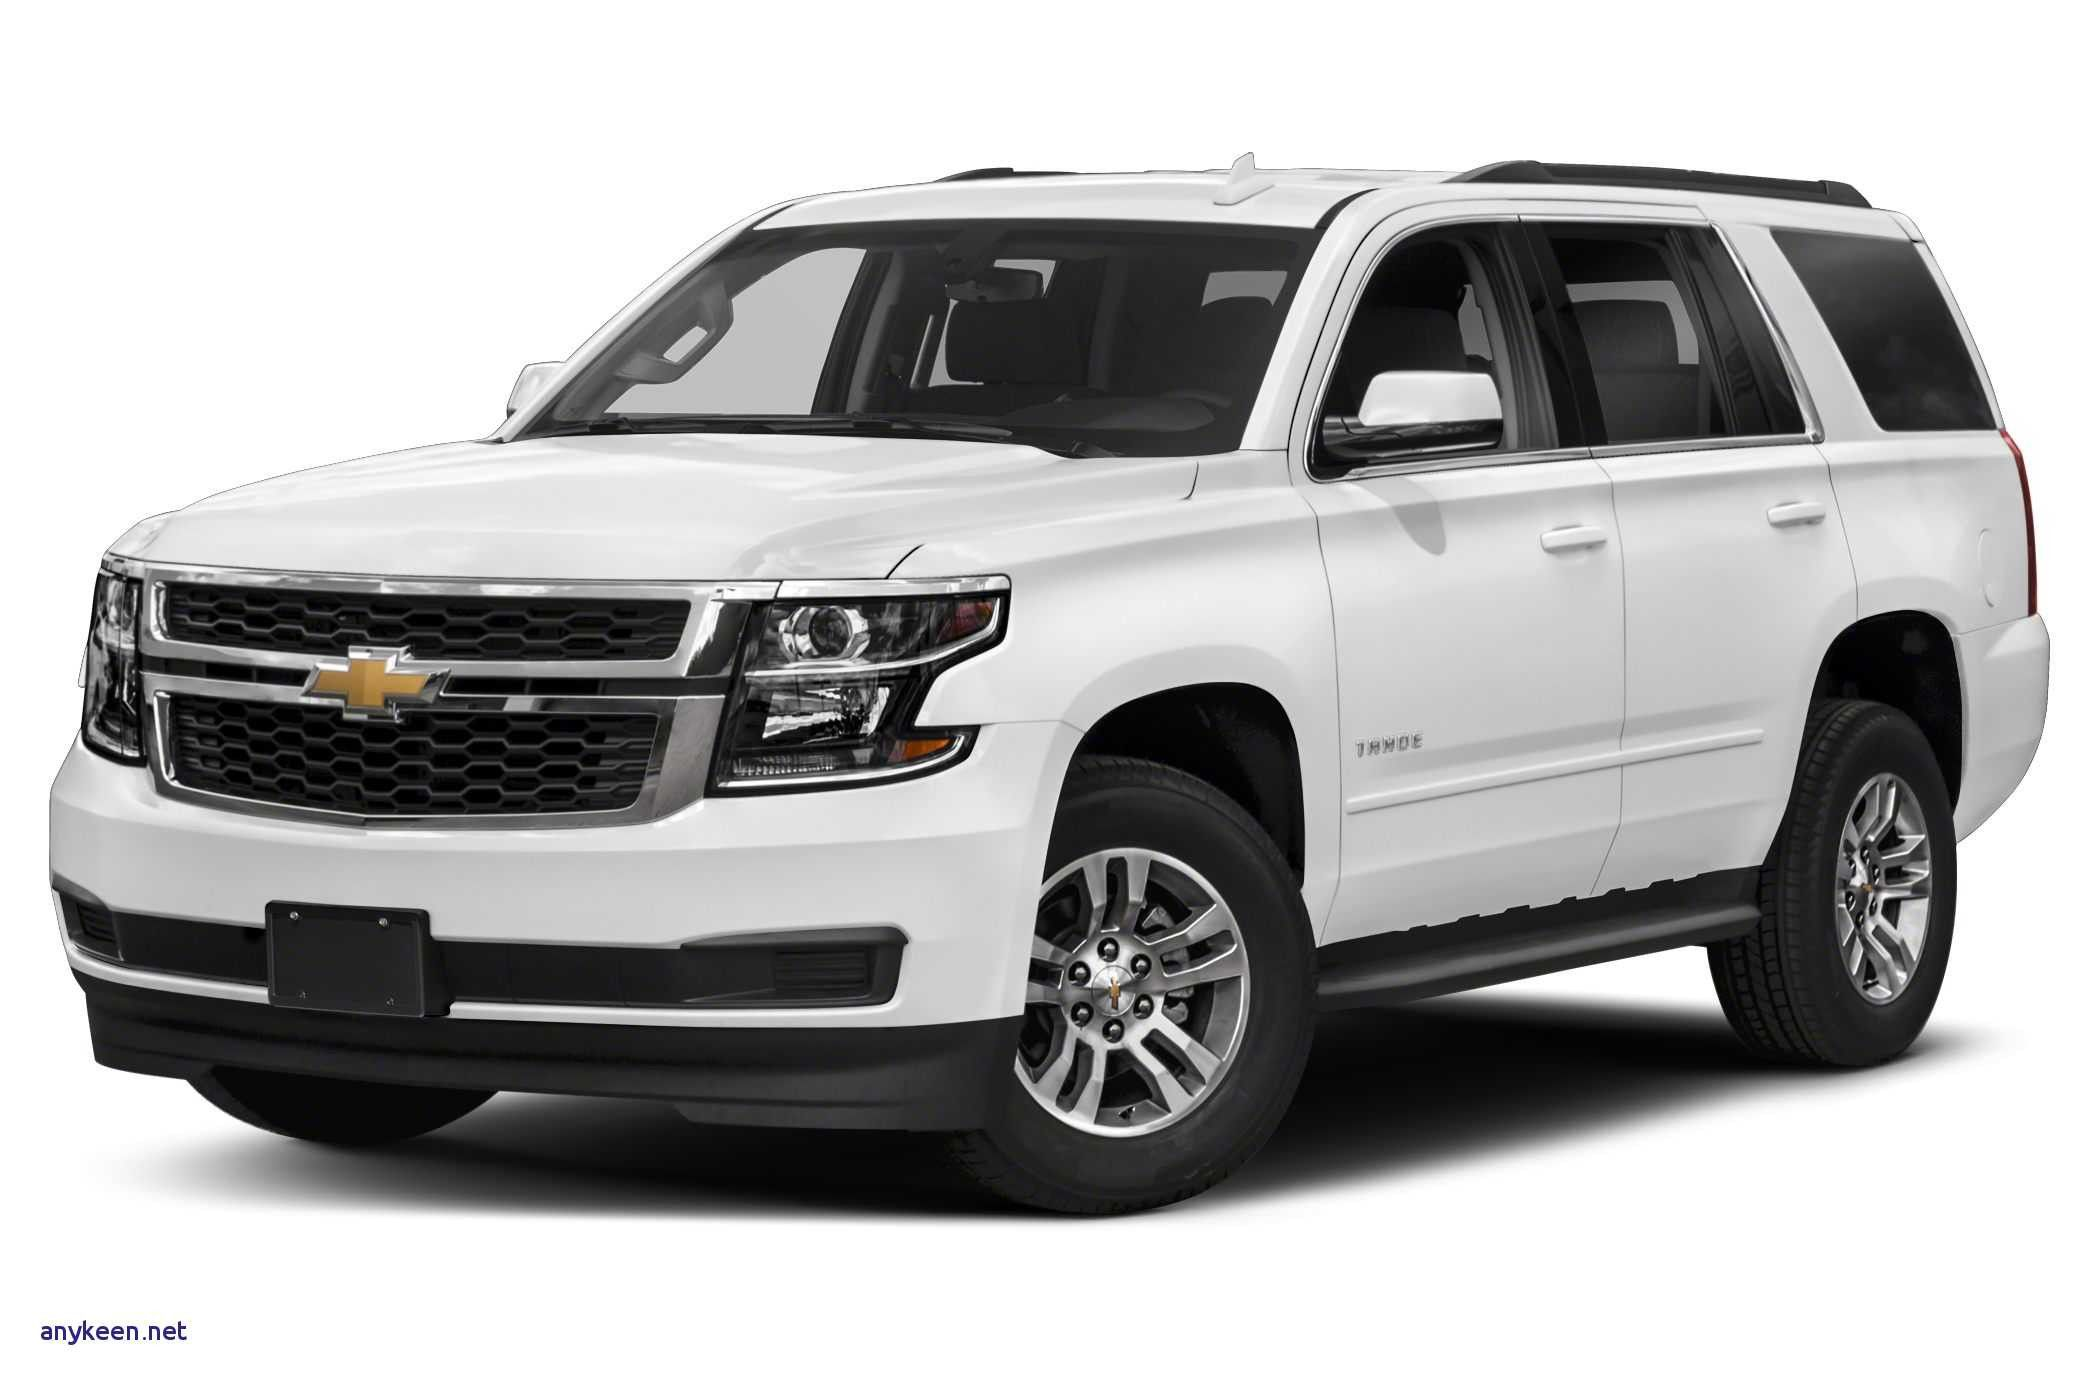 Chevy Tahoe 2019 Chevrolet tahoe, Chevy tahoe ltz, Chevy